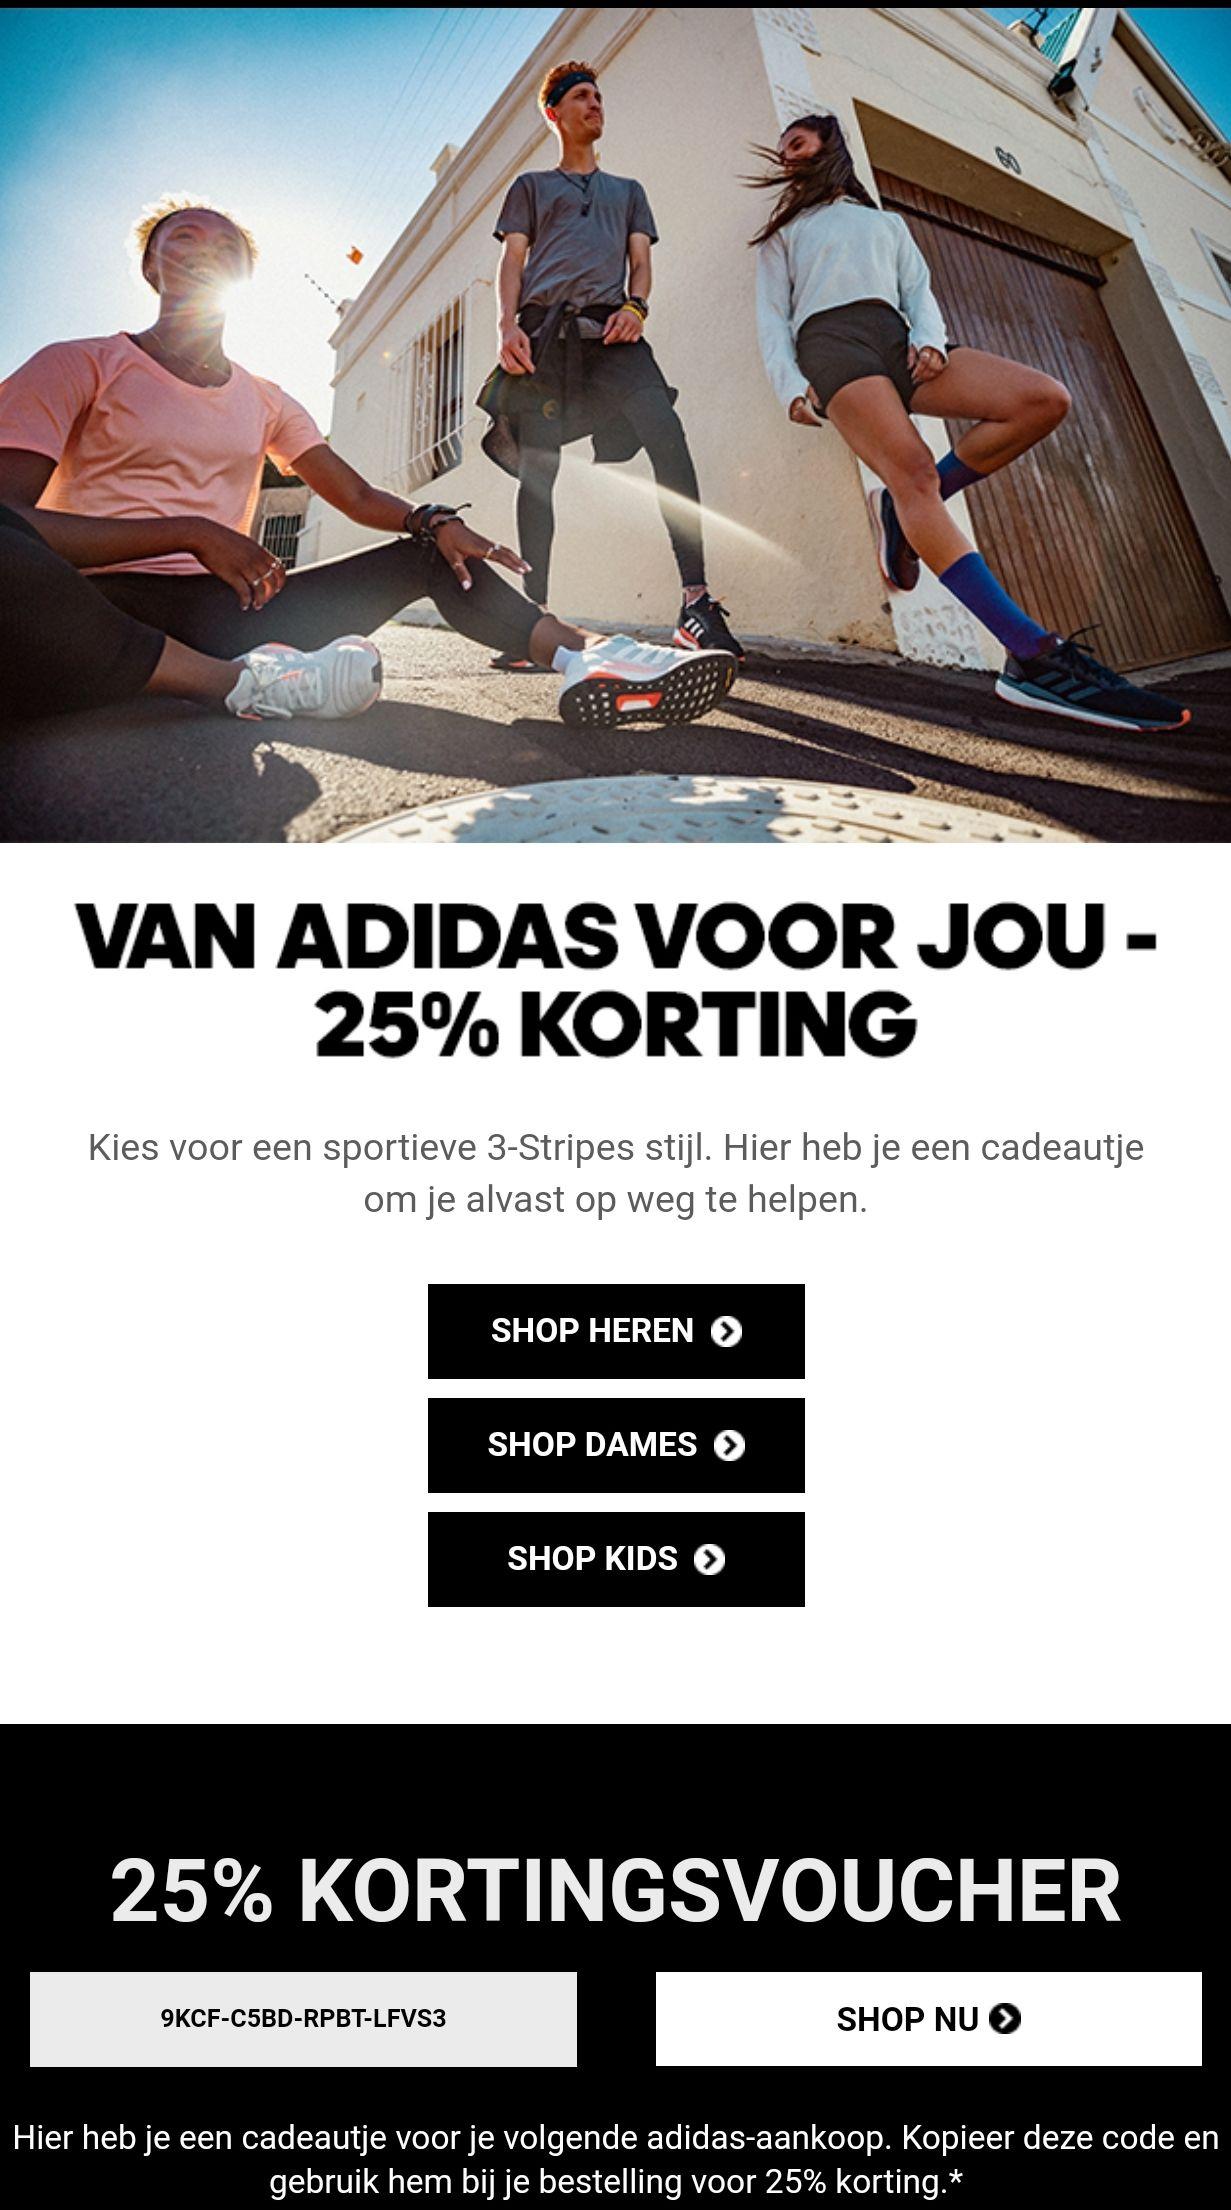 25% (extra) korting bij Adidas